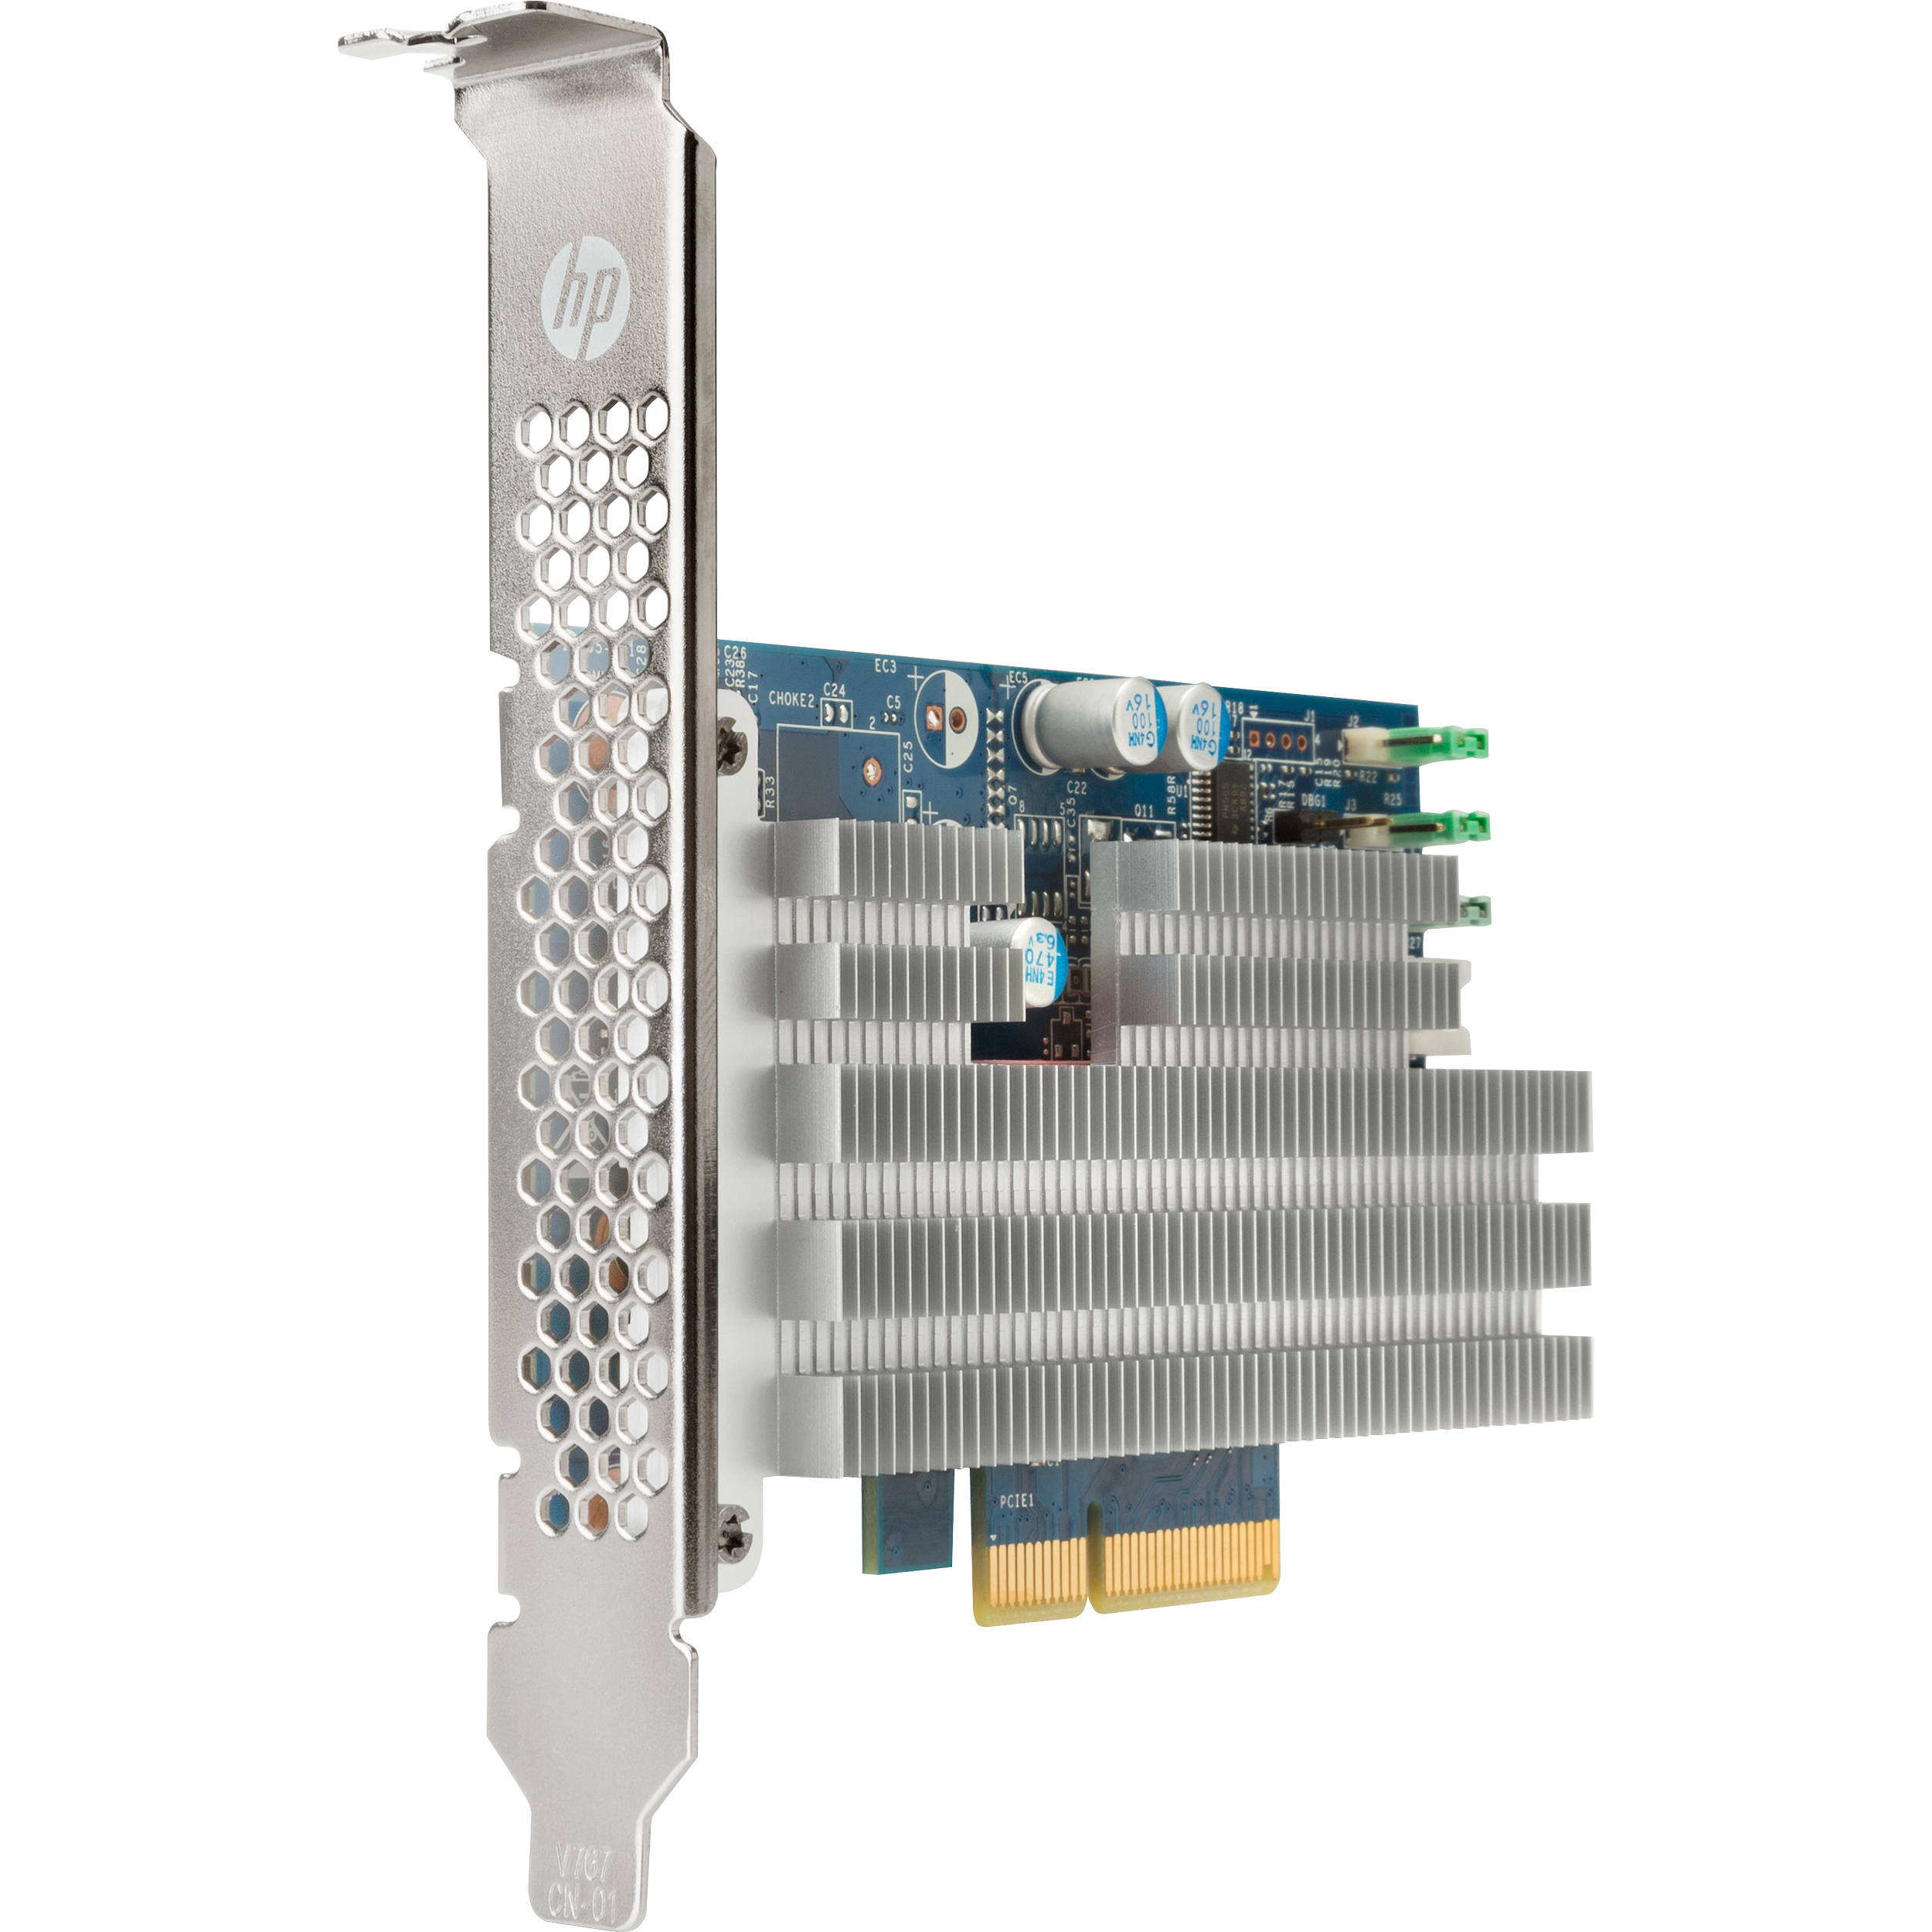 HP 512GB Turbo Drive G2 NVMe PCIe M 2 Internal SSD